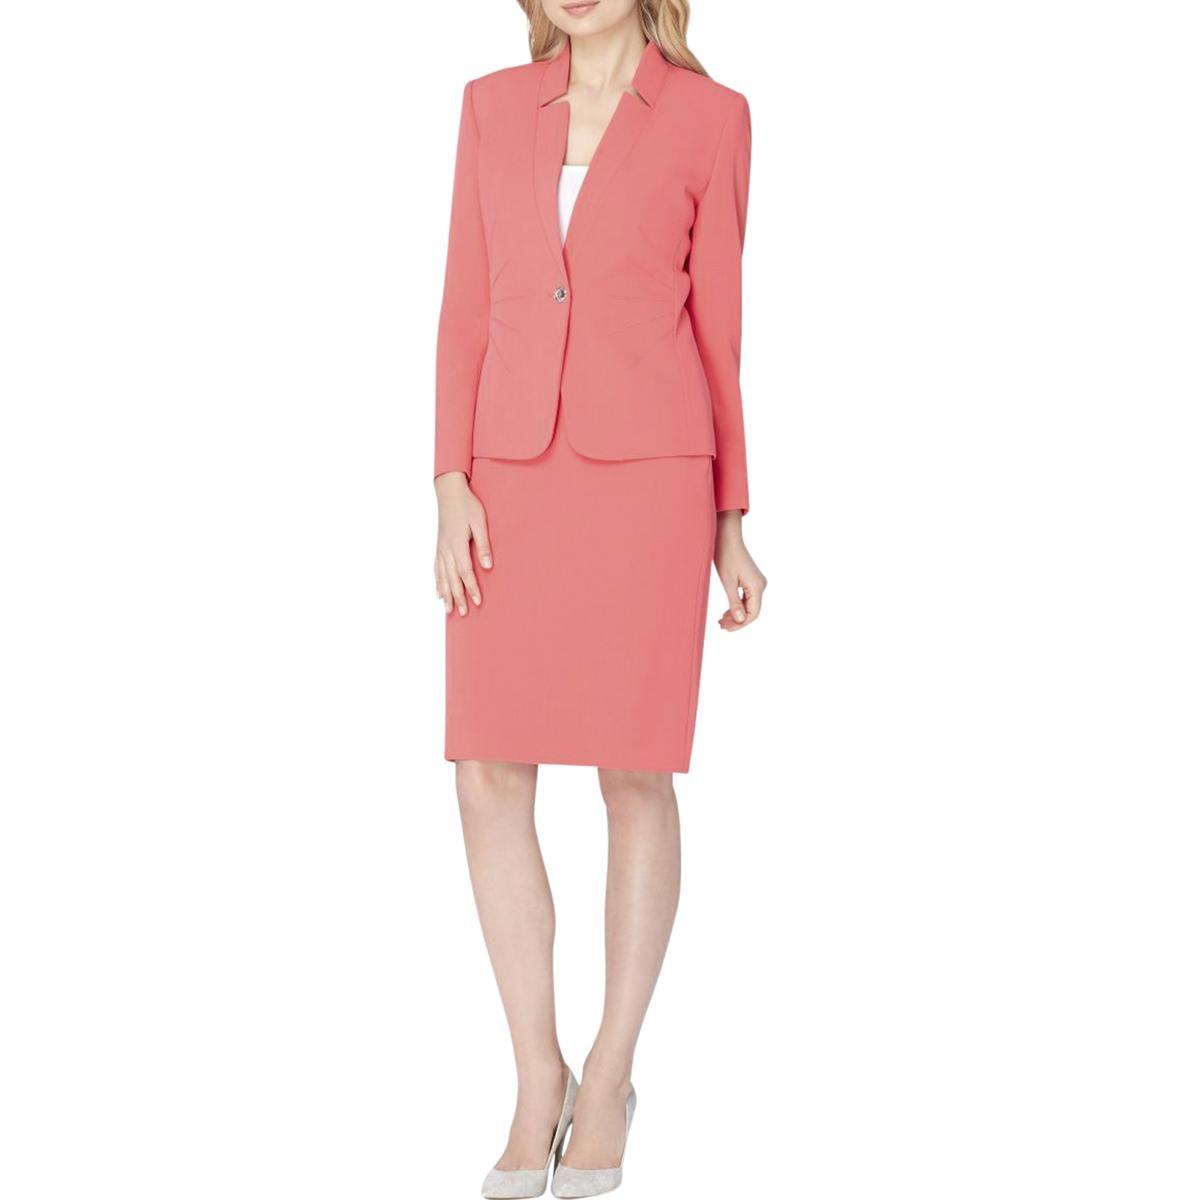 Tahari by Arthur S. Levine Women's Petite Size Crepe One Button Skirt Suit, Tangerine, 10P